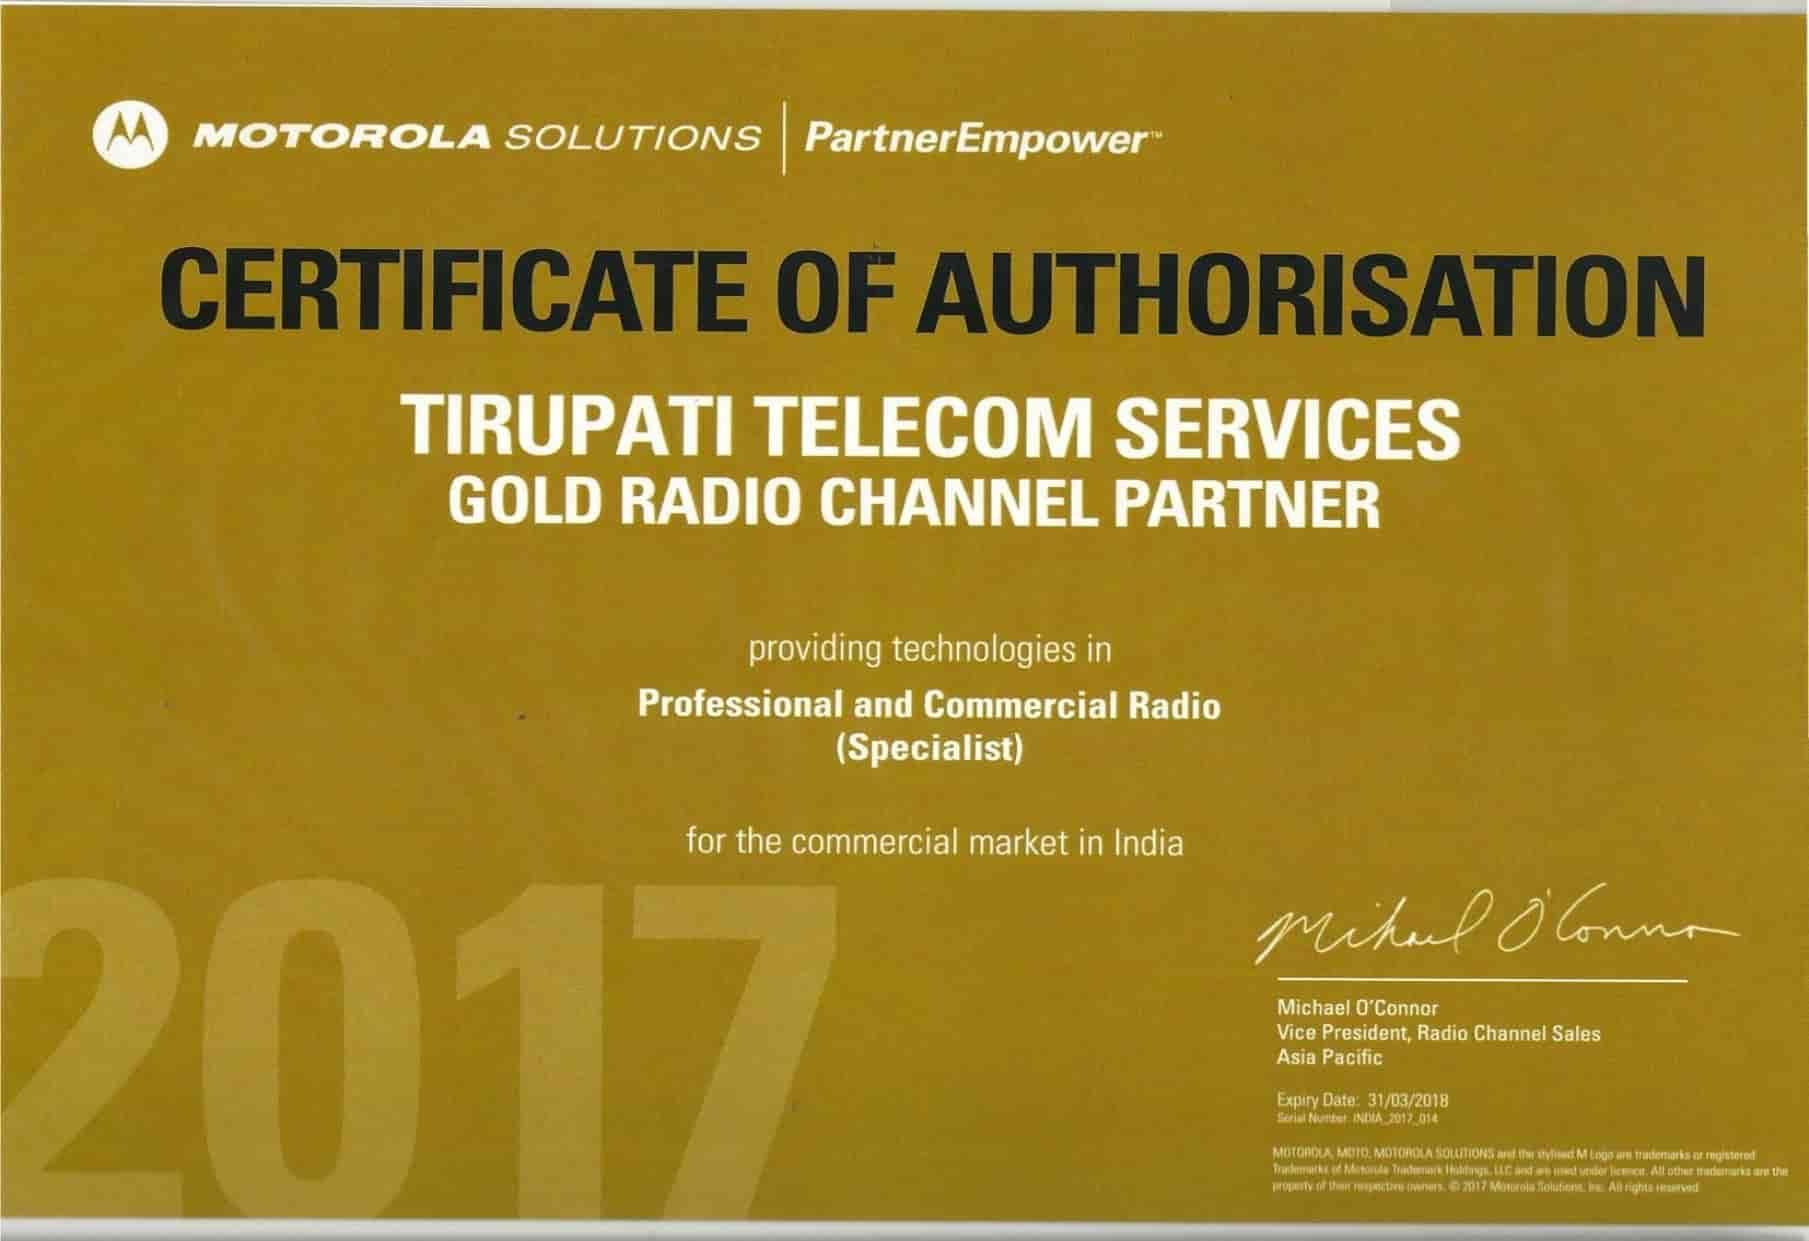 Tirupati Telecom Services, Gurukul - Wireless Radio System Dealers